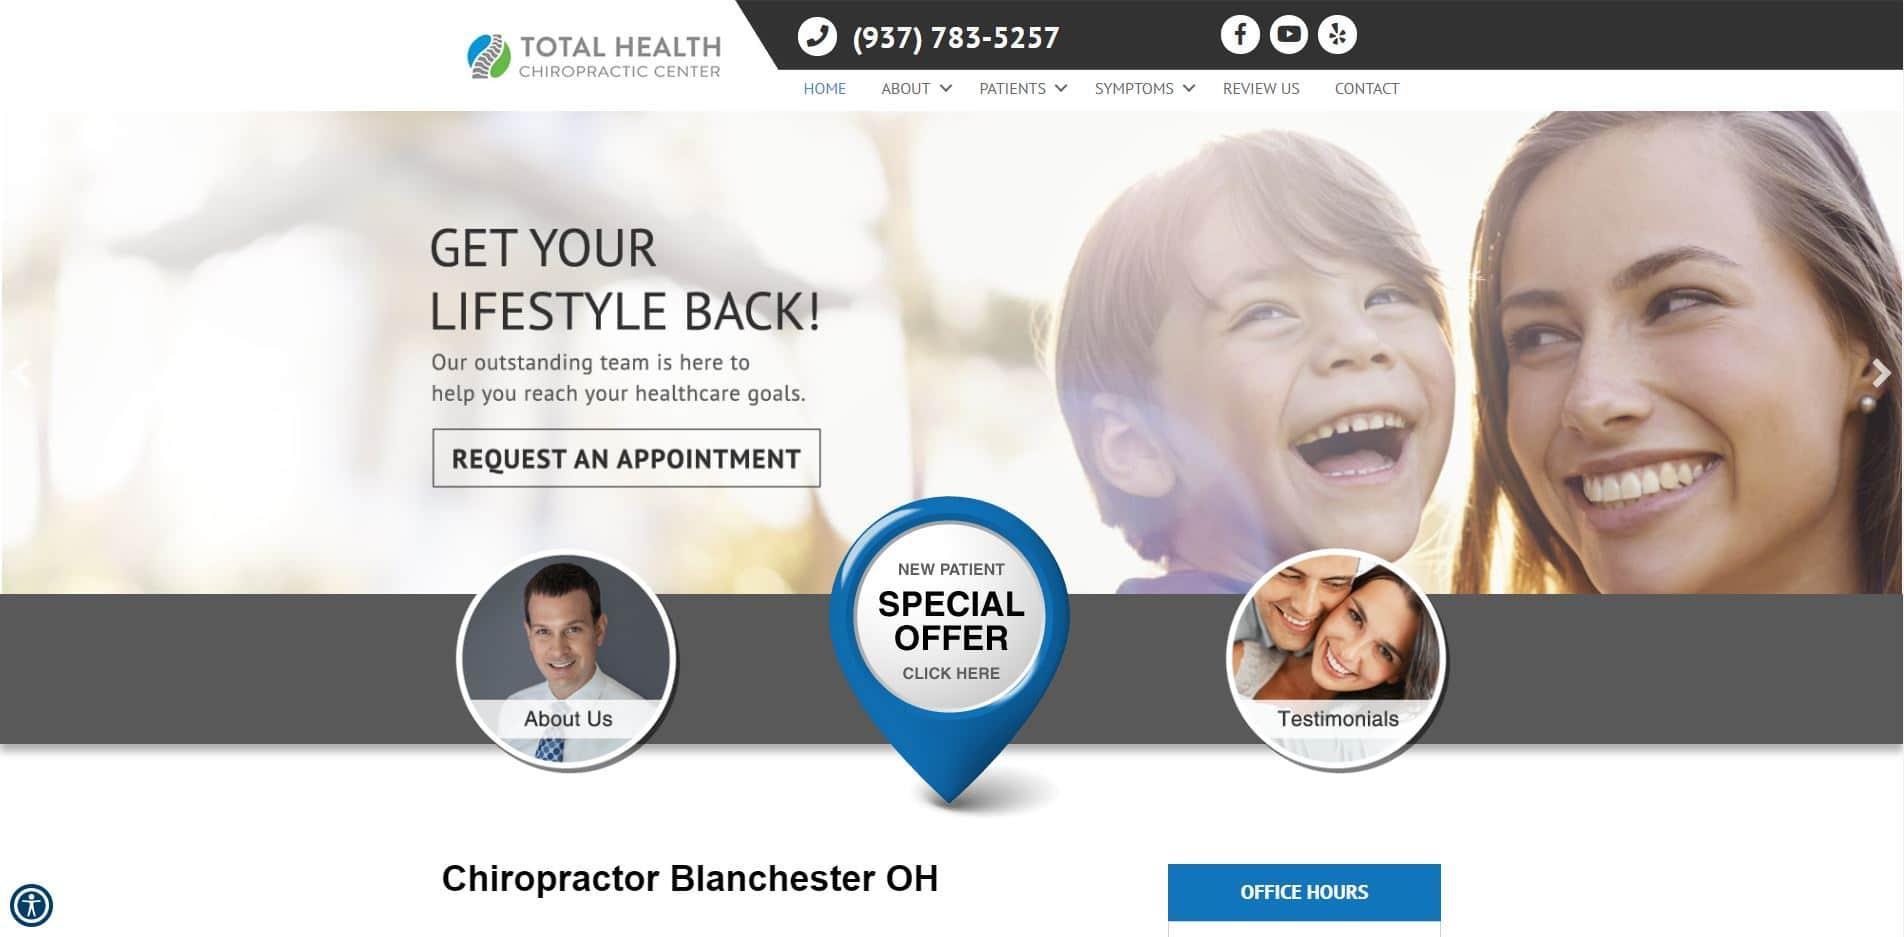 Chiropractor in Blanchester